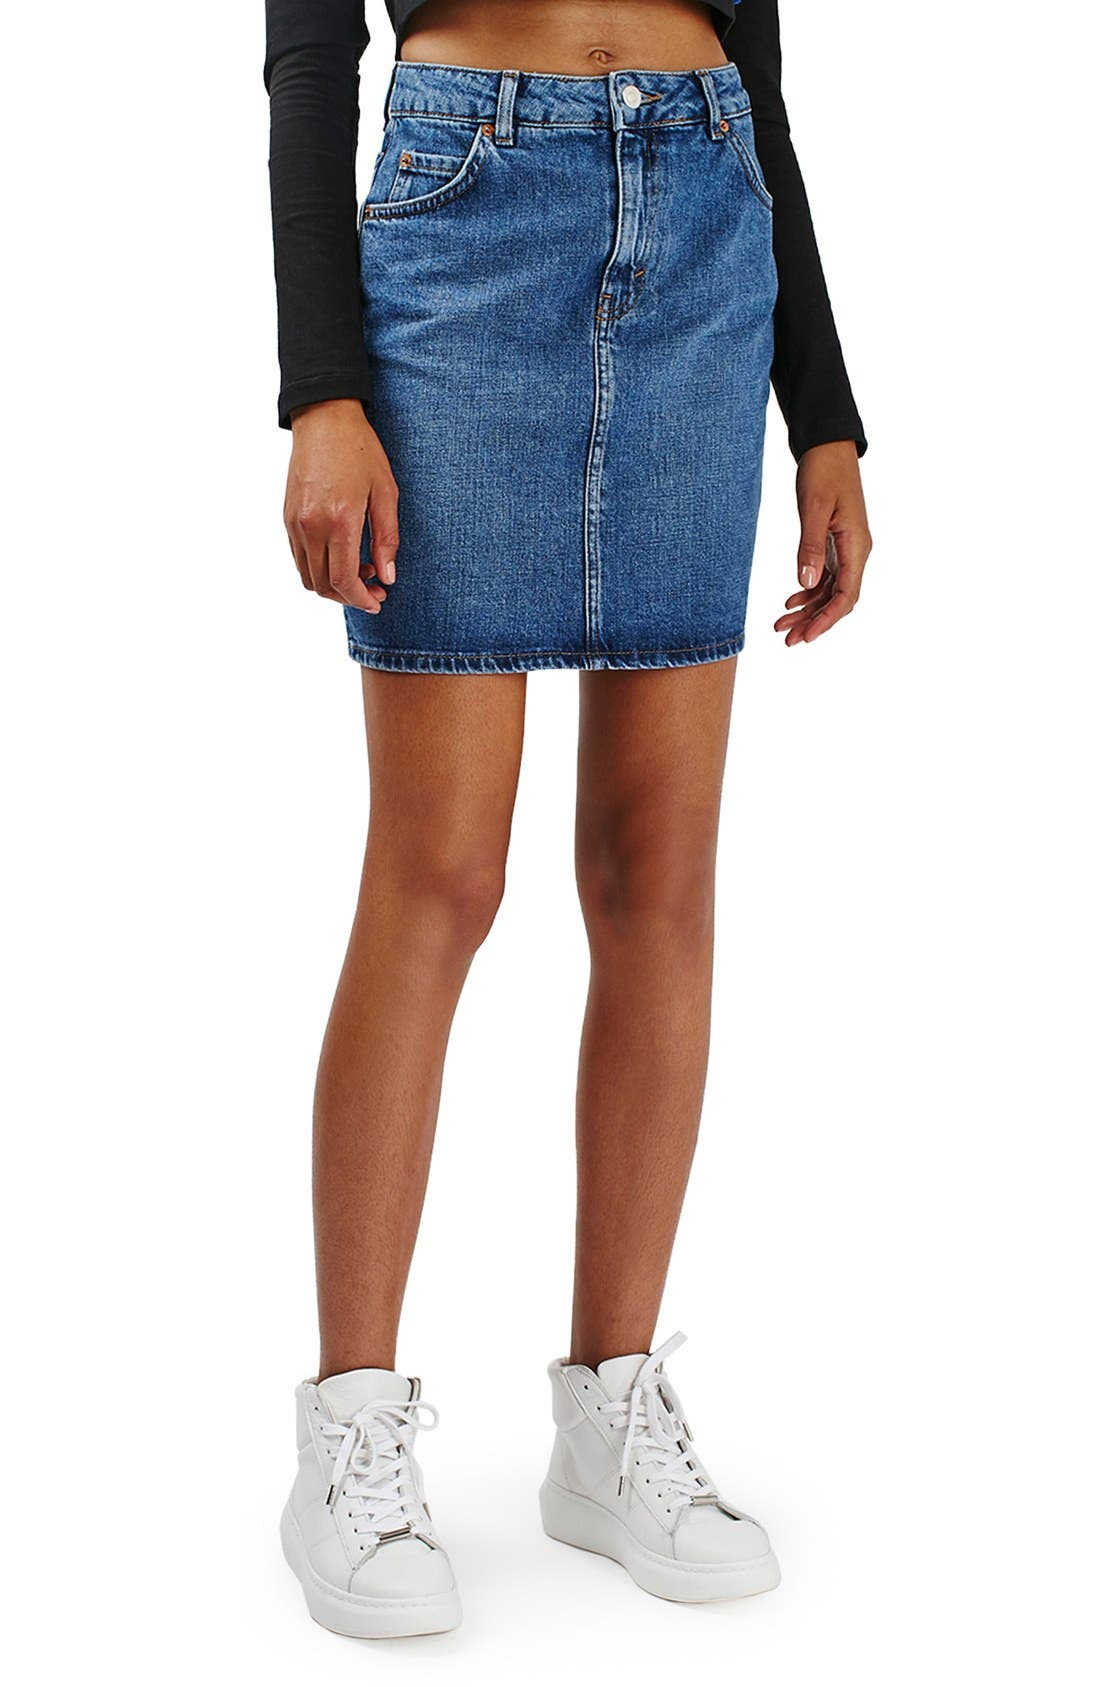 Alternate Image 1 Selected - Topshop Moto High Rise Denim Skirt